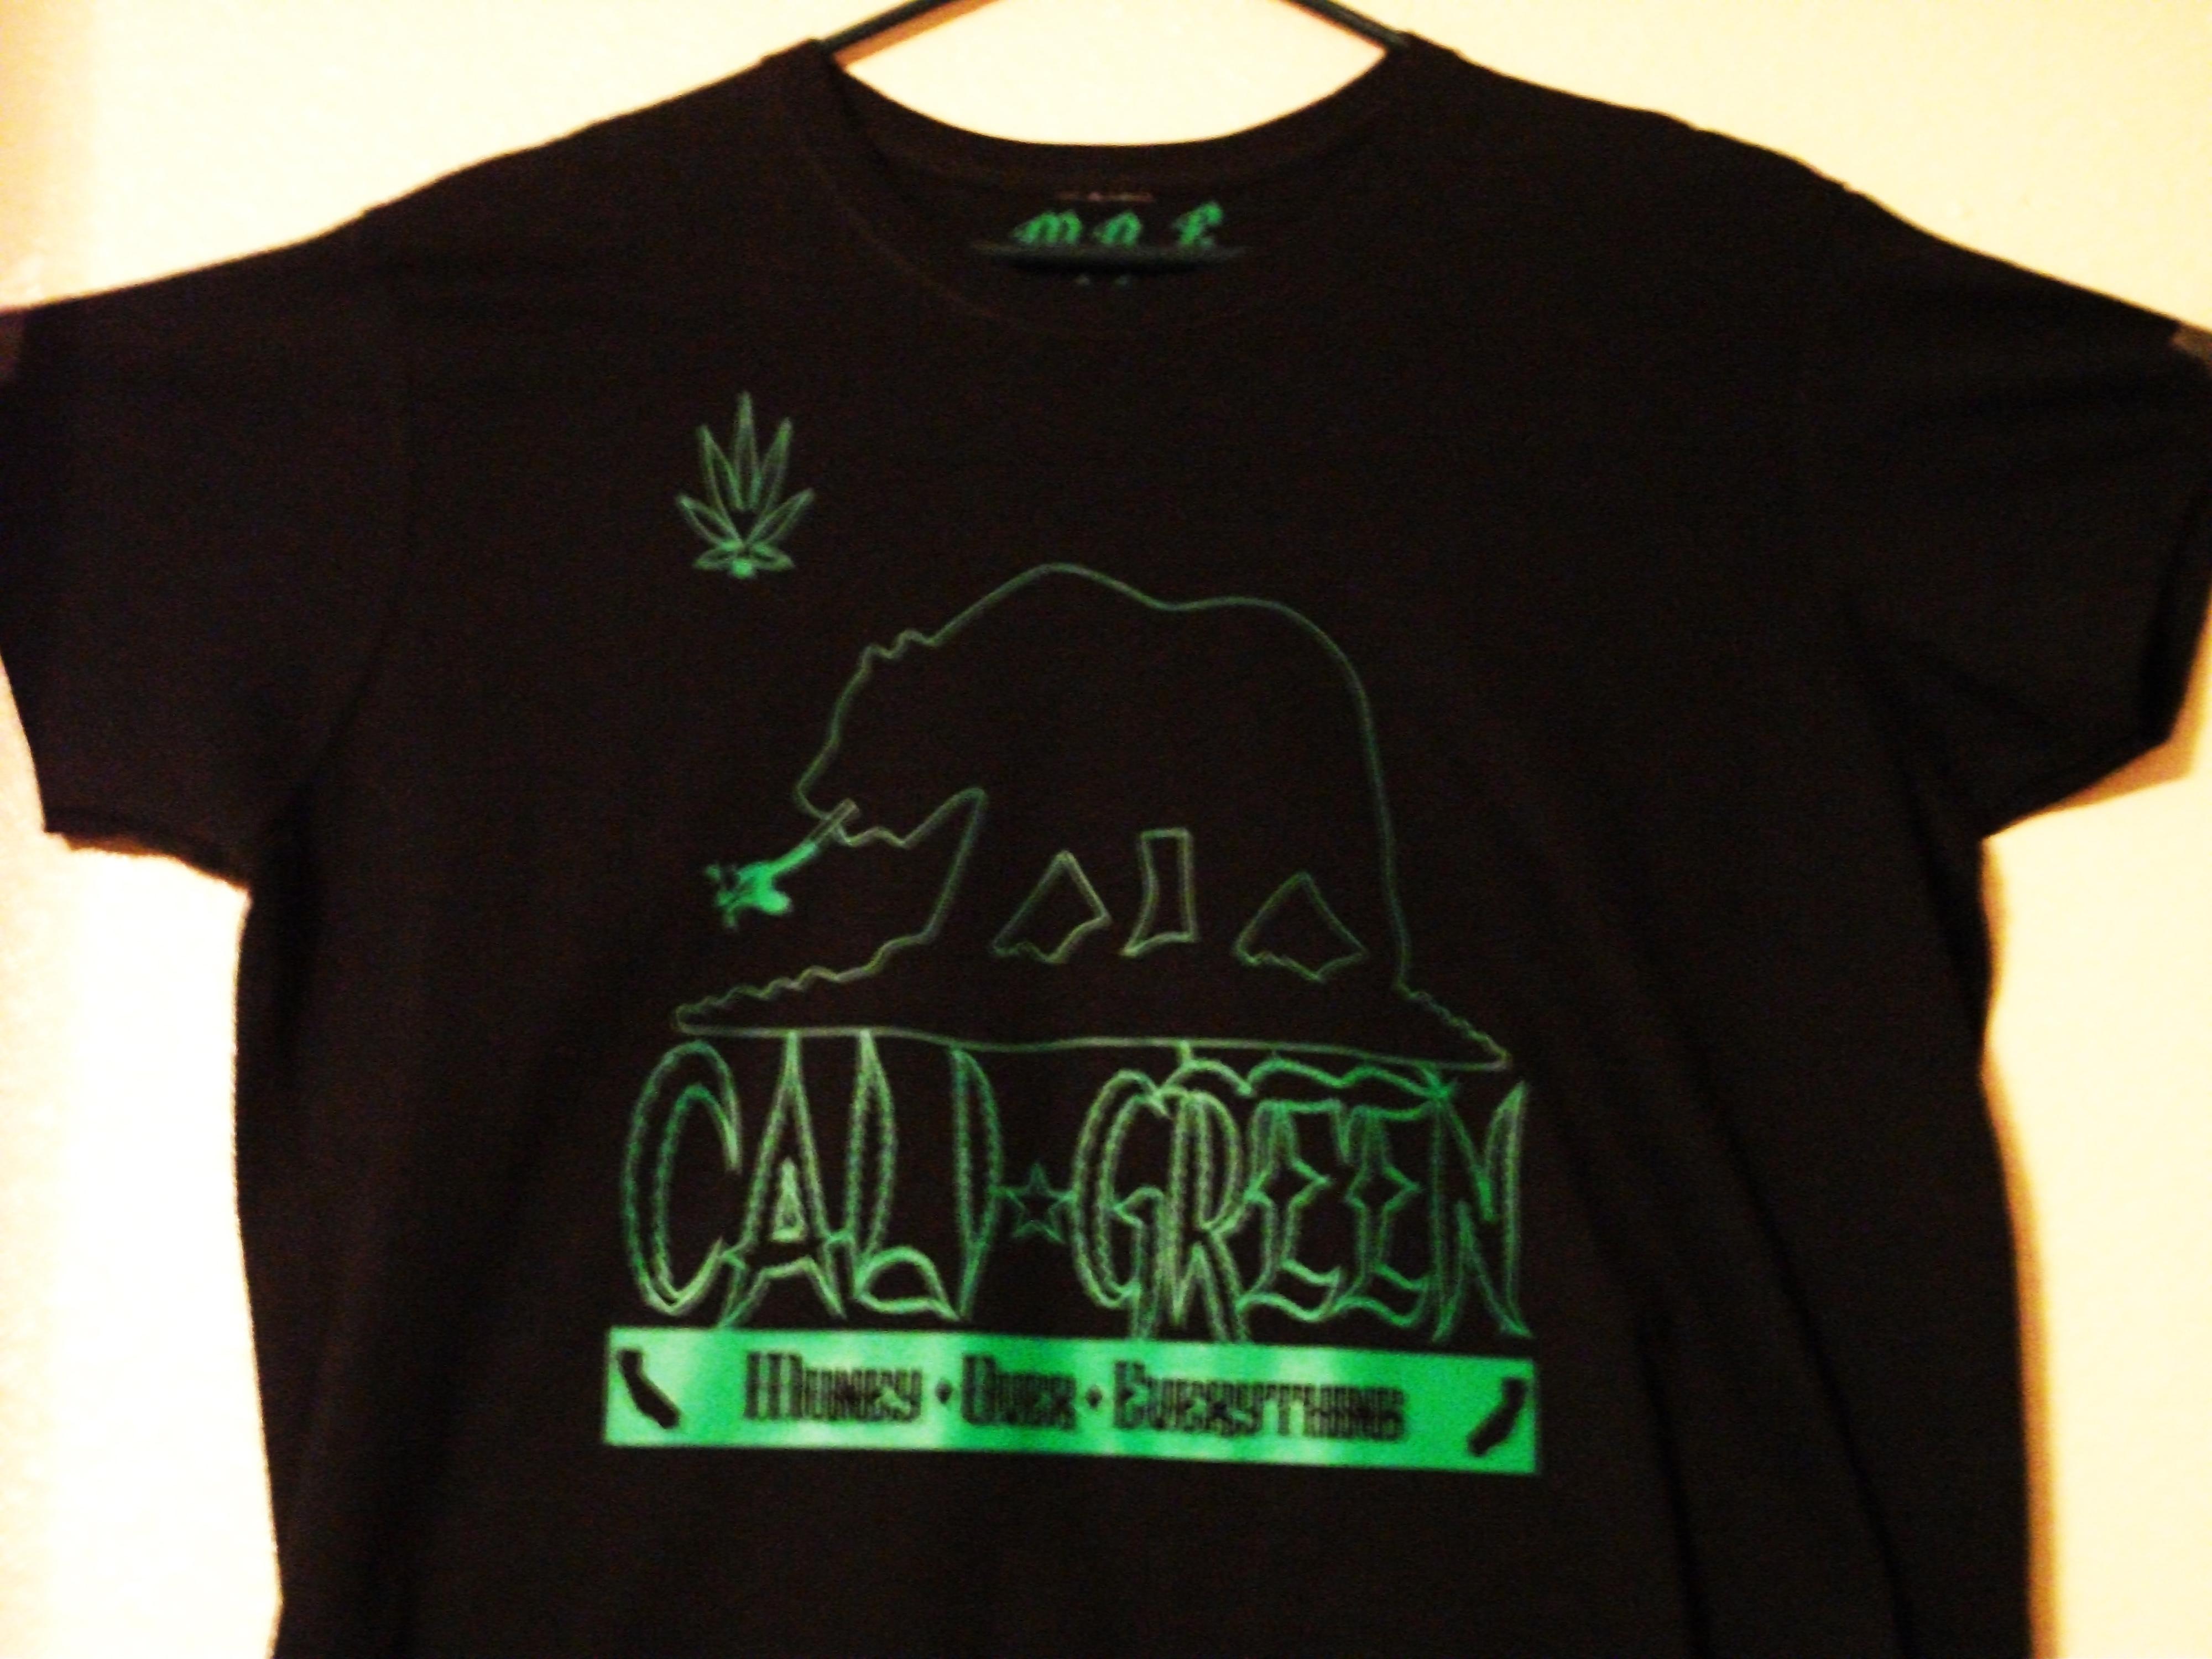 M.O.E. UNLTD. CLOTHING | Cali Green Women's Black/Green T-Shirt ...